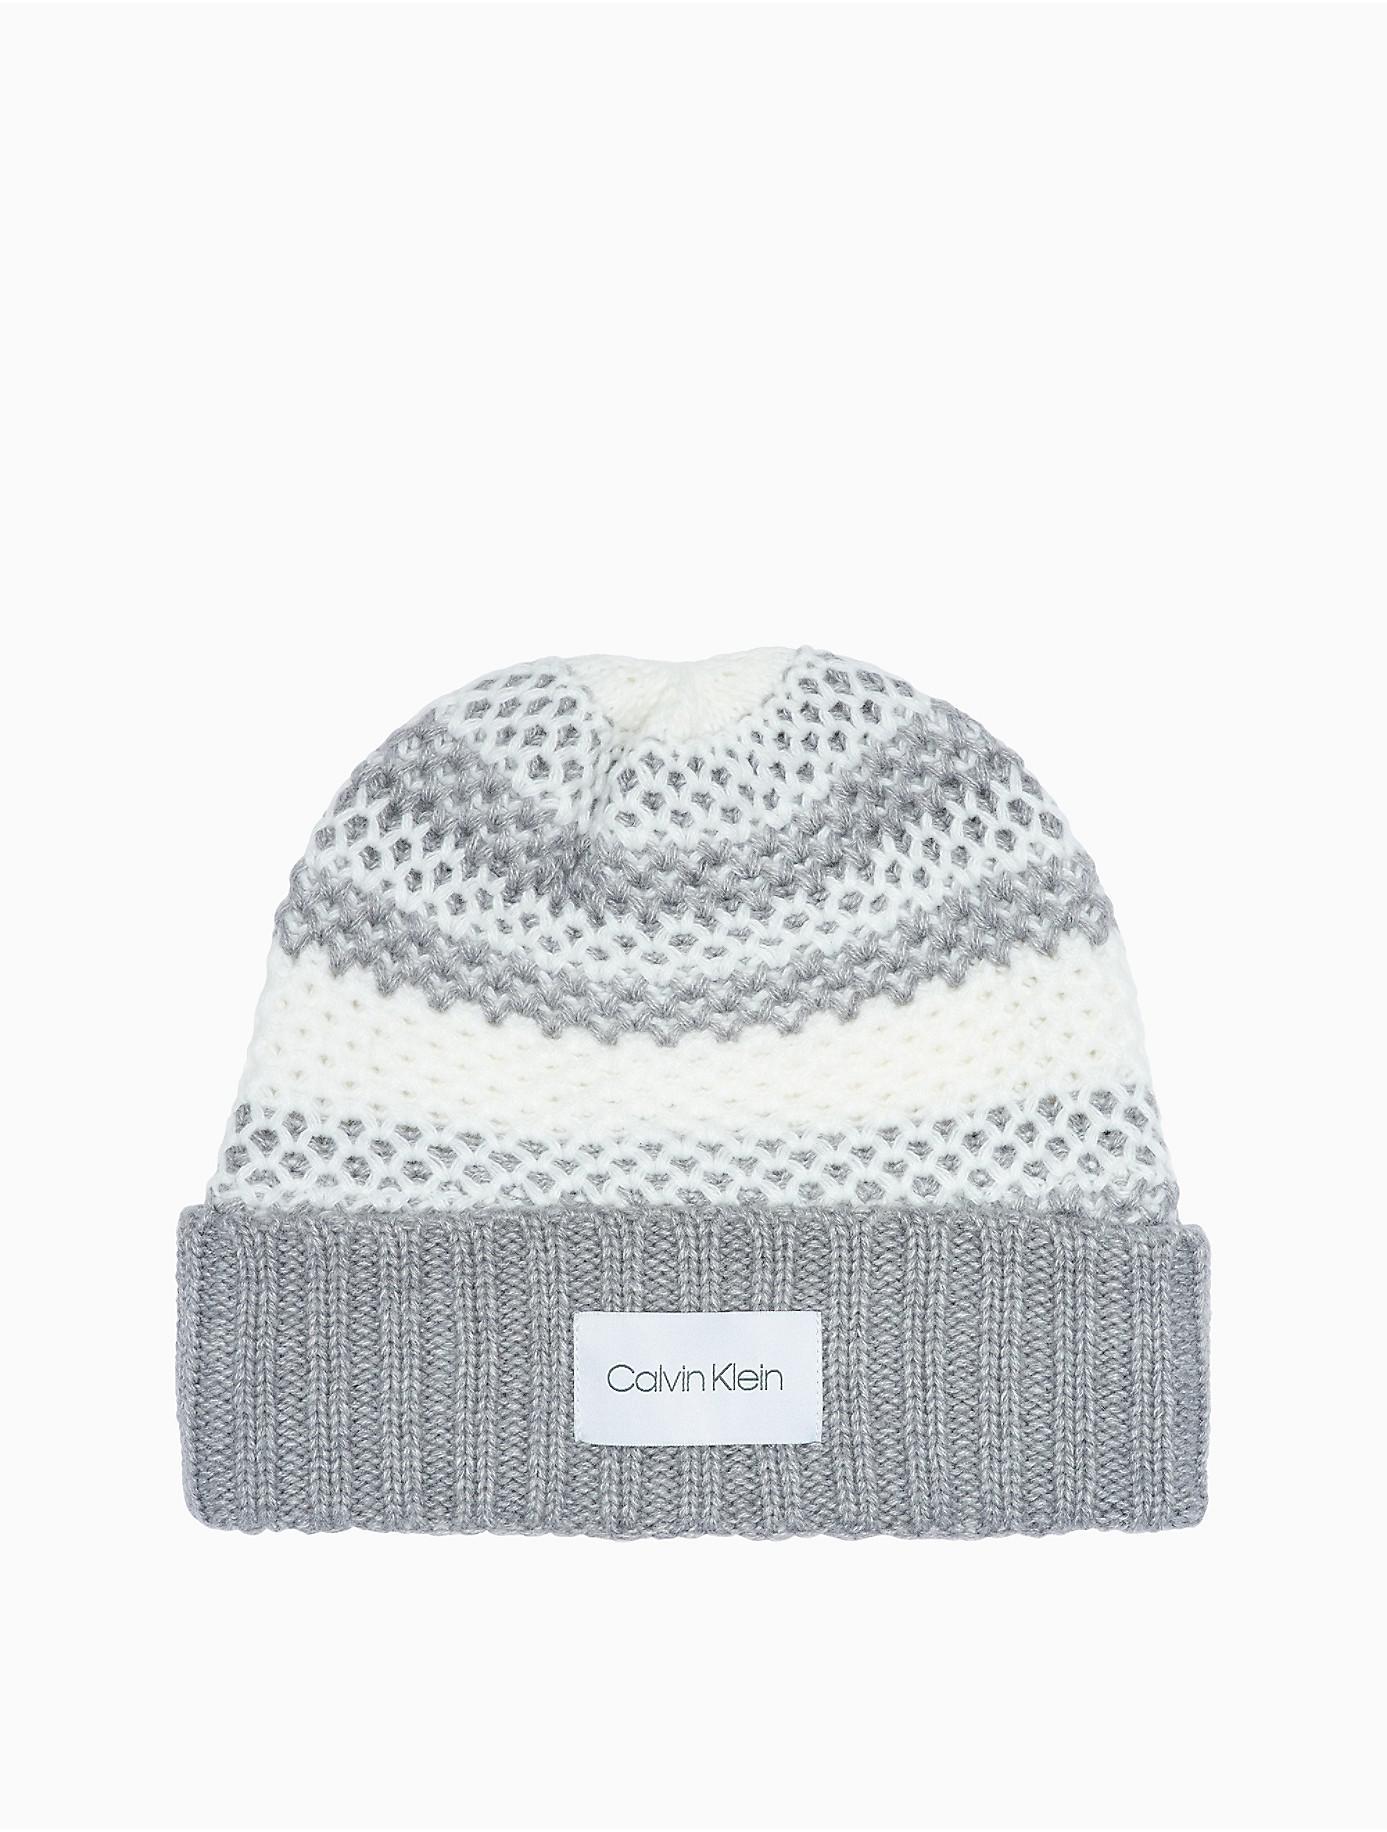 70faa785 Lyst - Calvin Klein Honeycomb Knit Striped Logo Hat in Gray